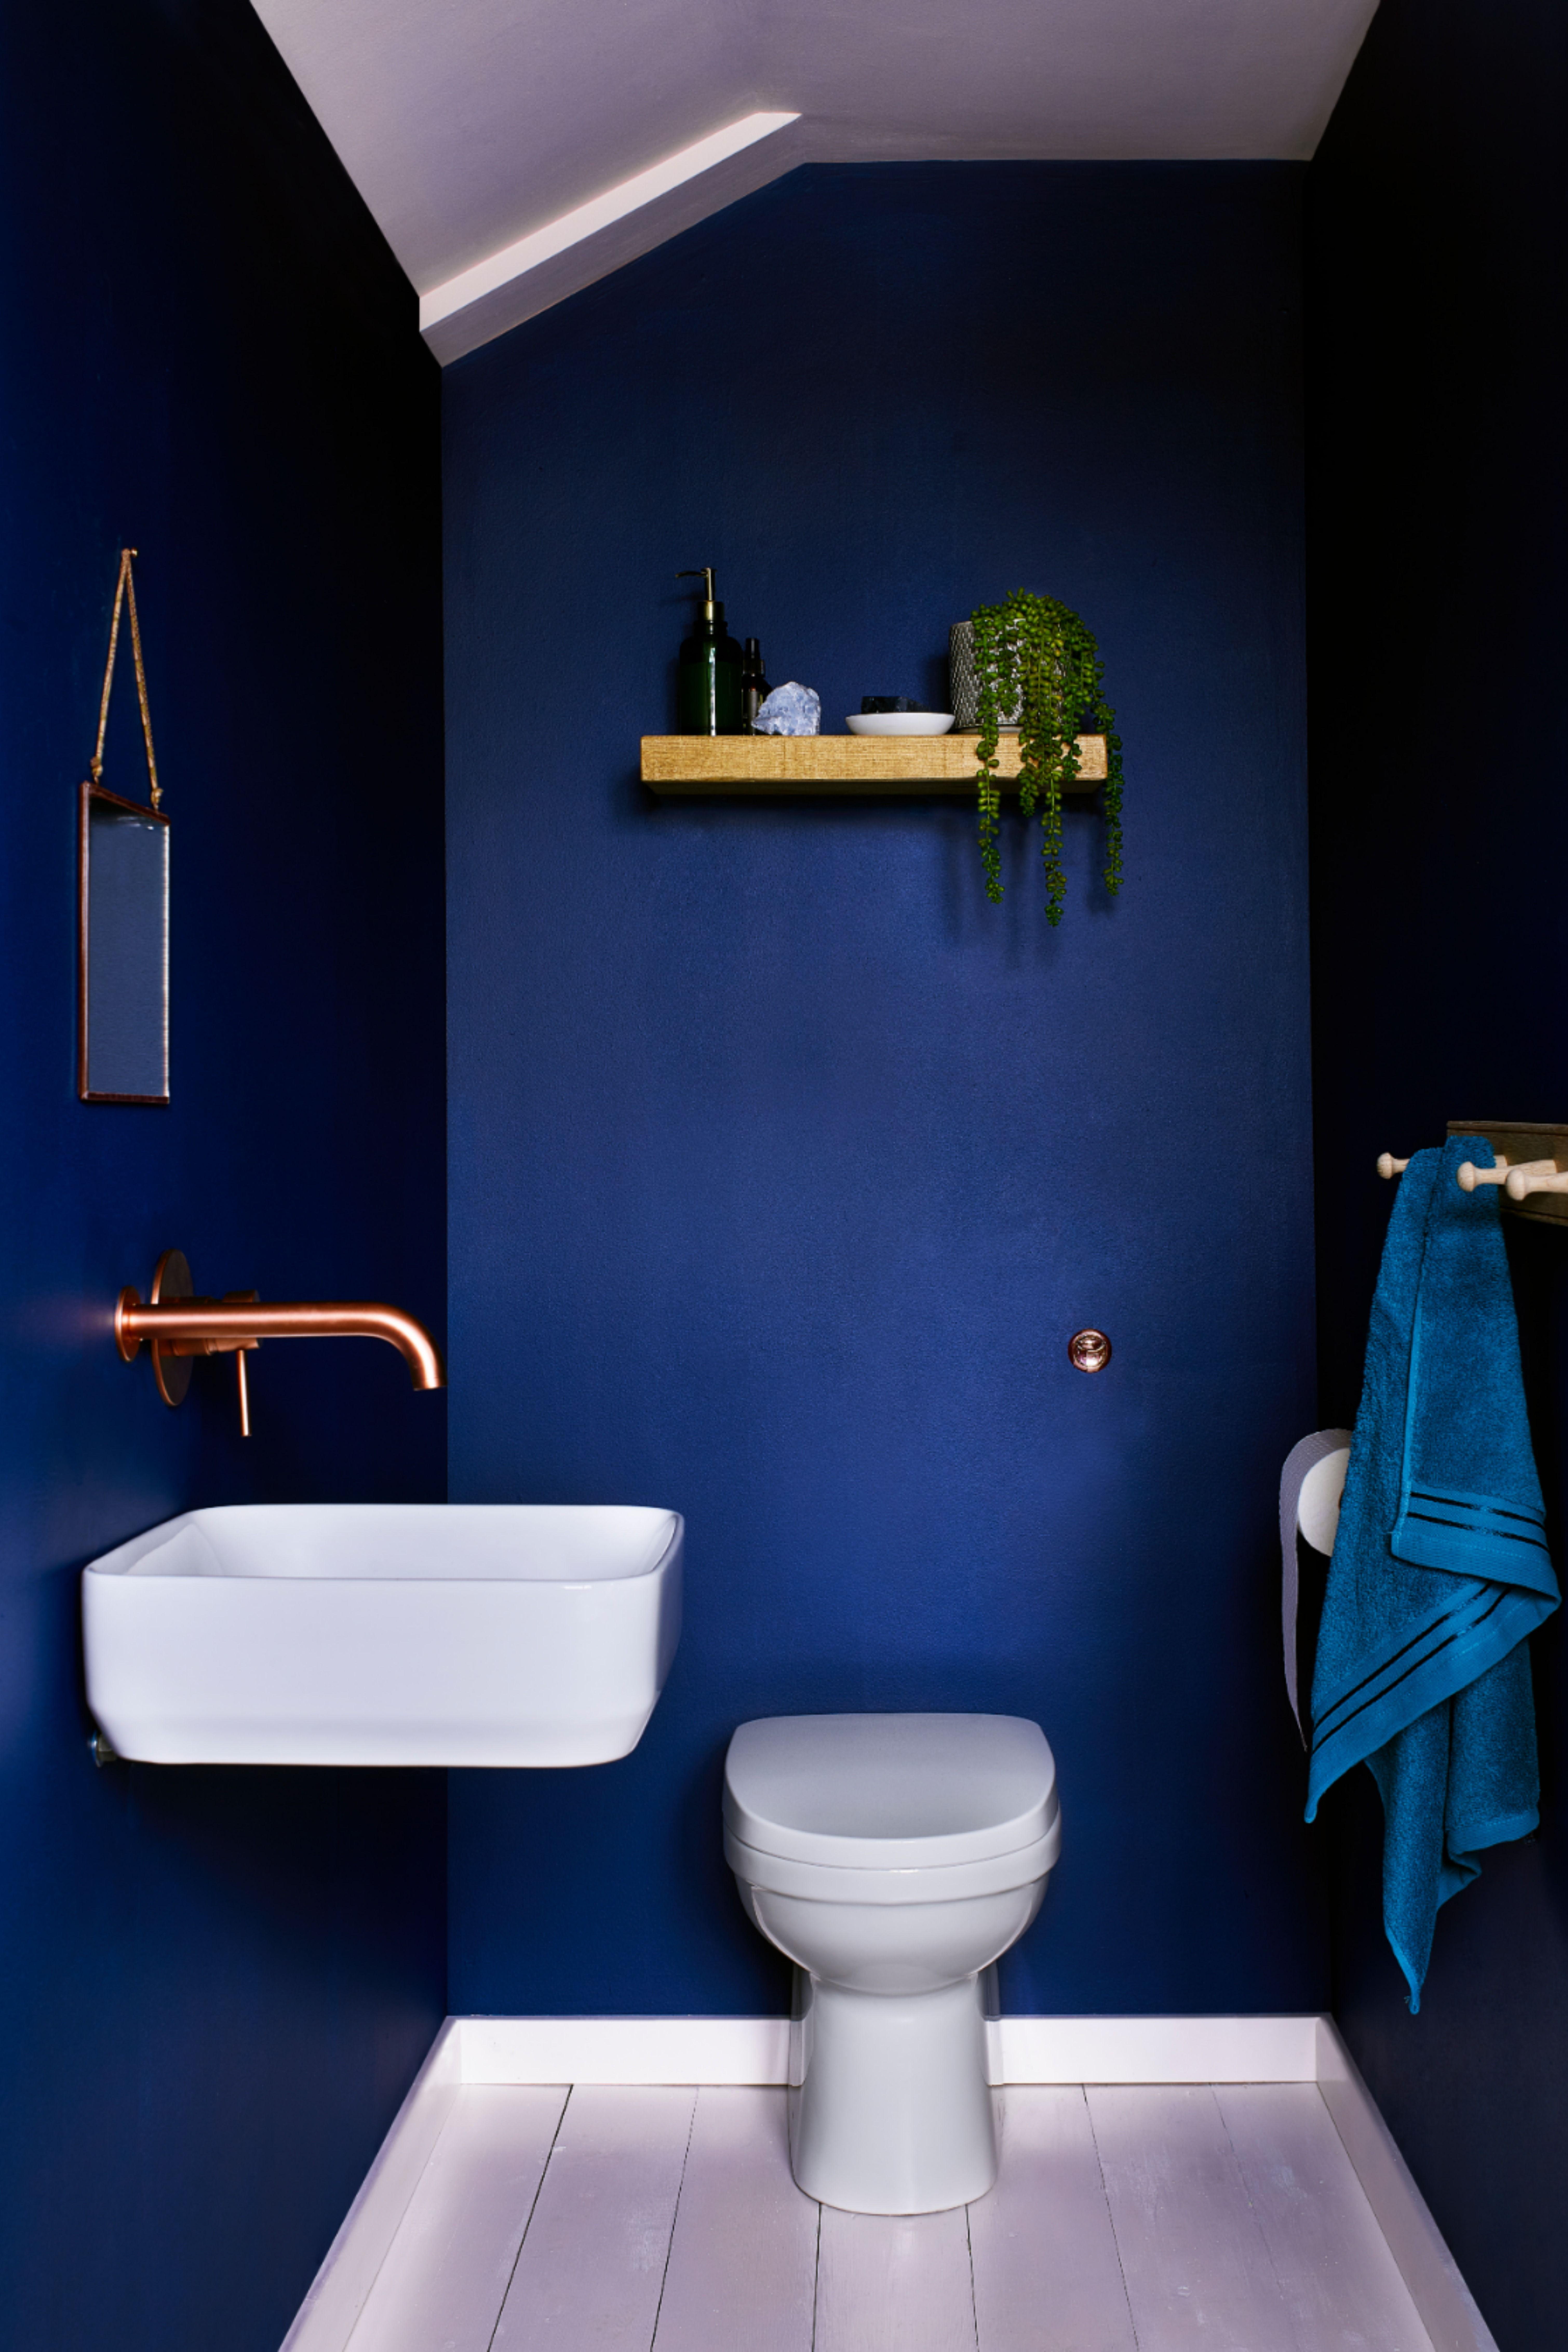 Mur Bleu En 2020 Deco Salle De Bain Bleue Salles De Bains Bleu Fonce Couleurs De Peinture Salle De Bains